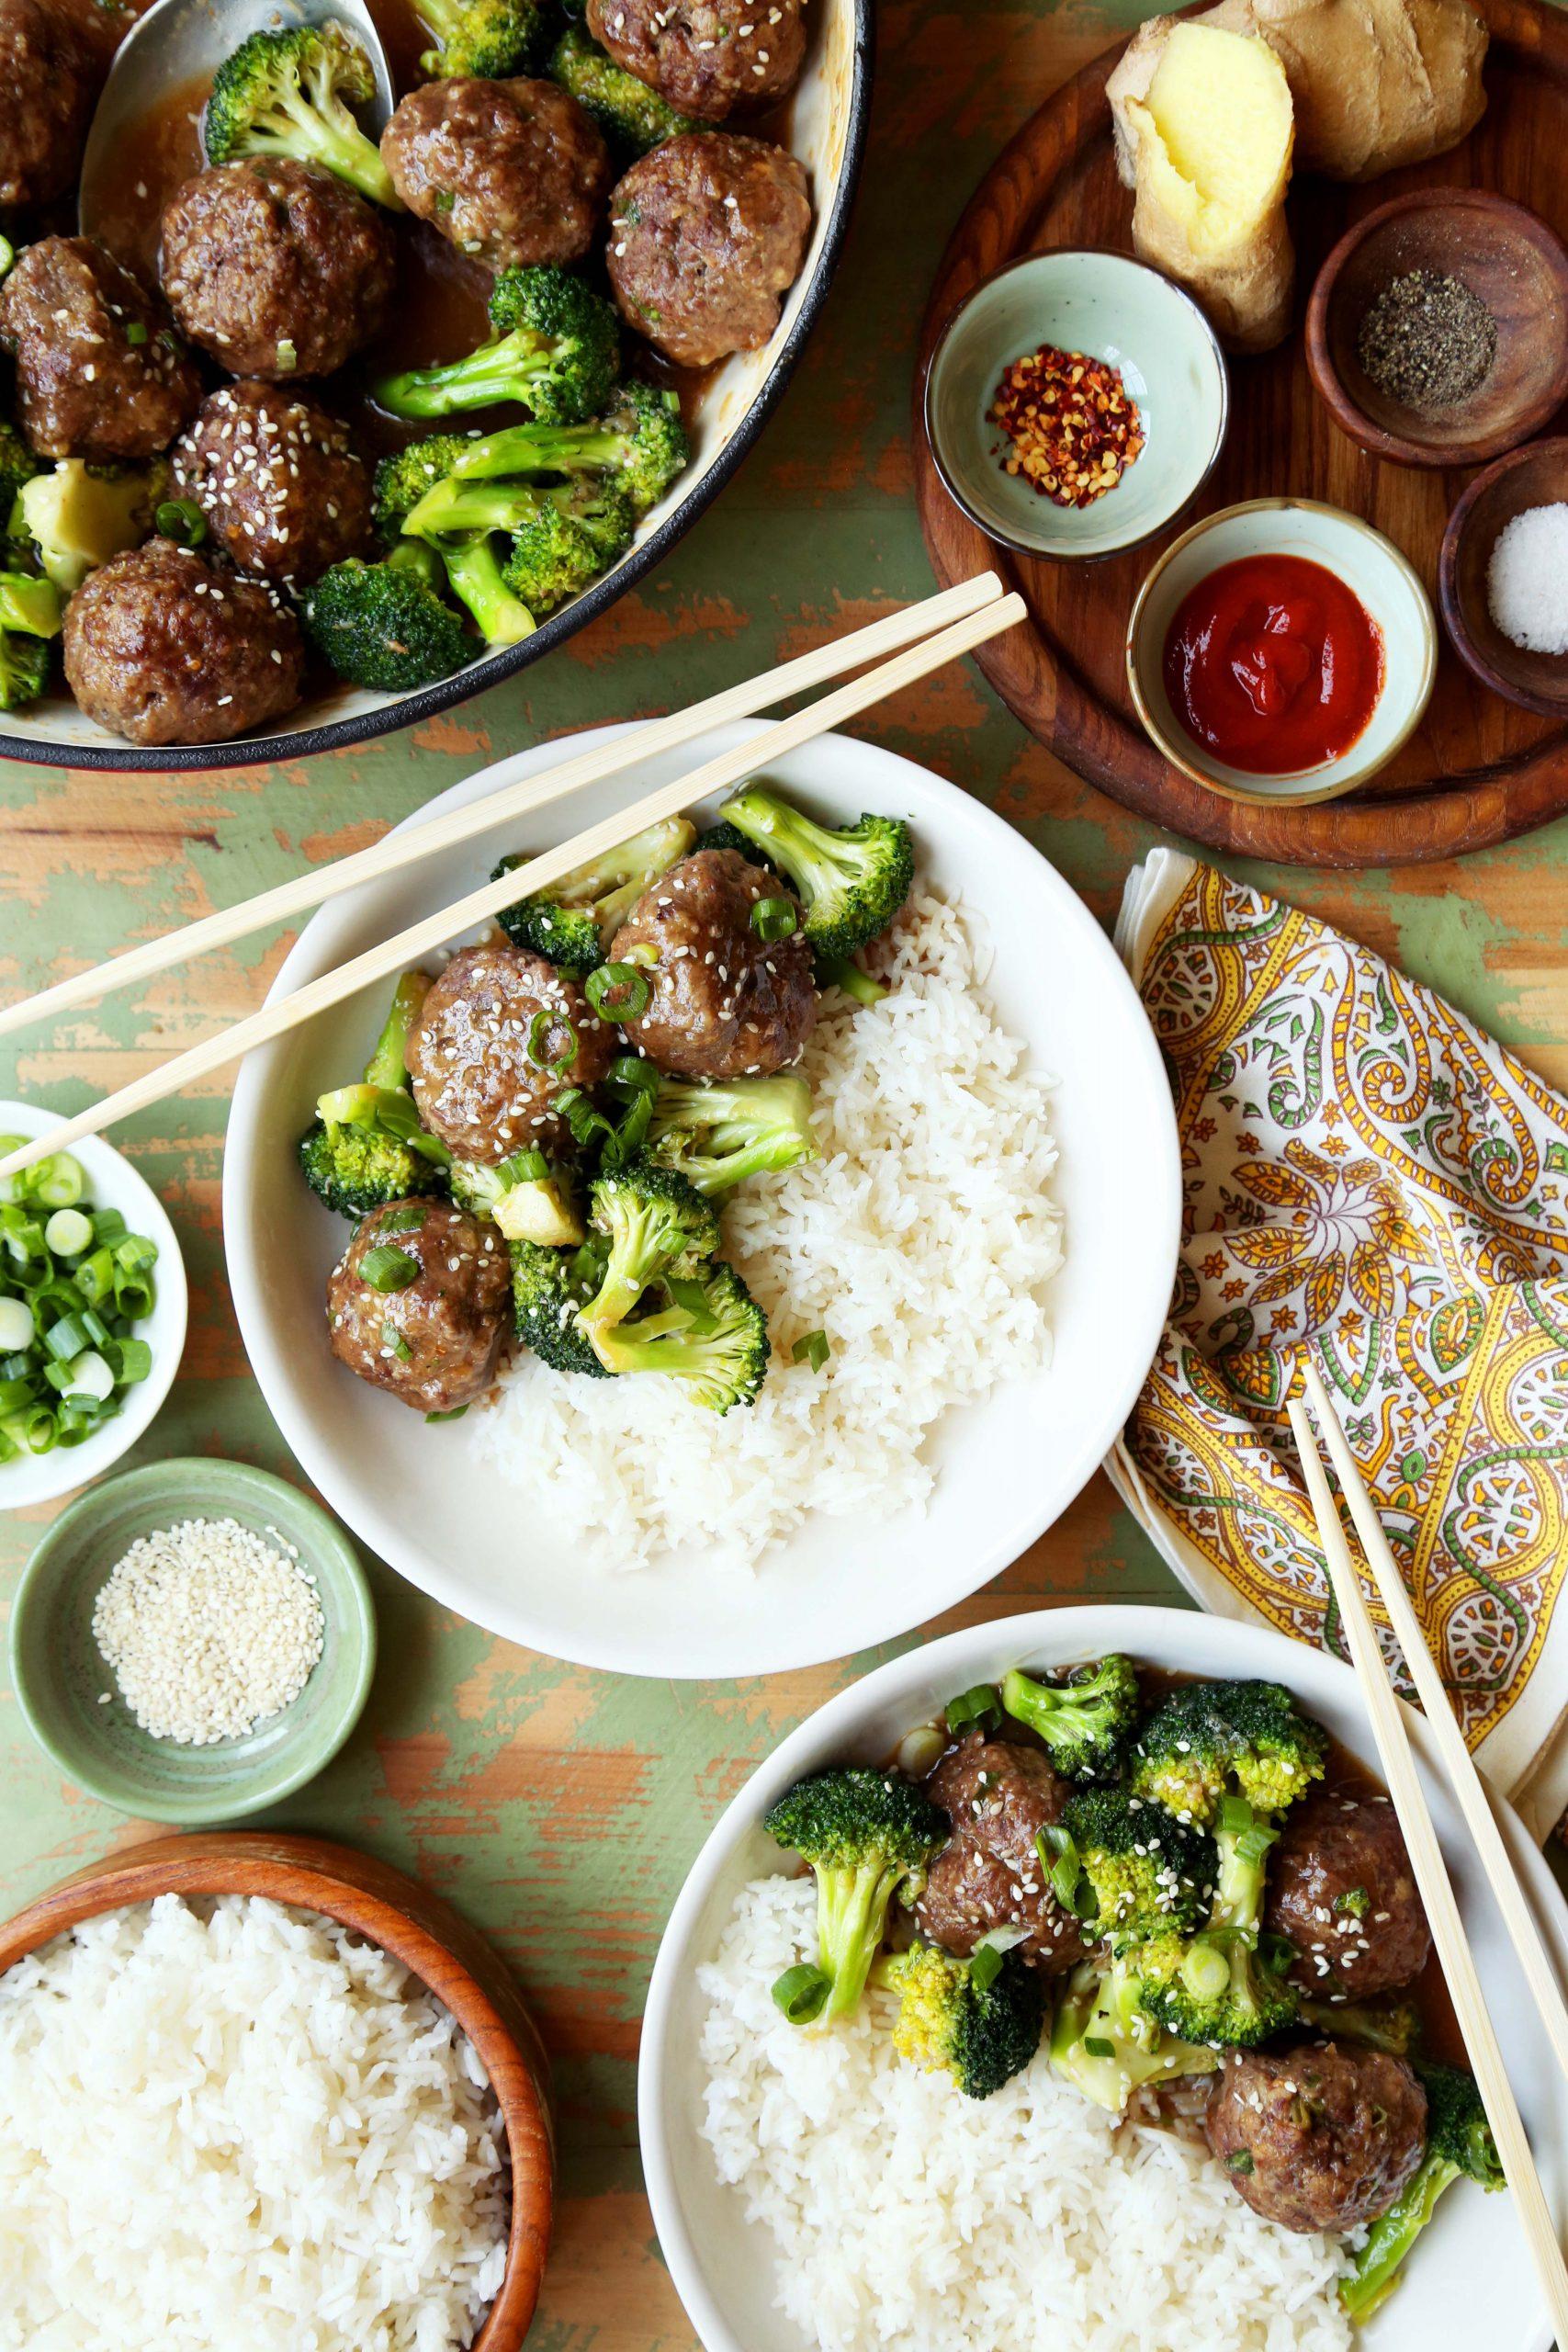 Meatball Beef and Broccoli